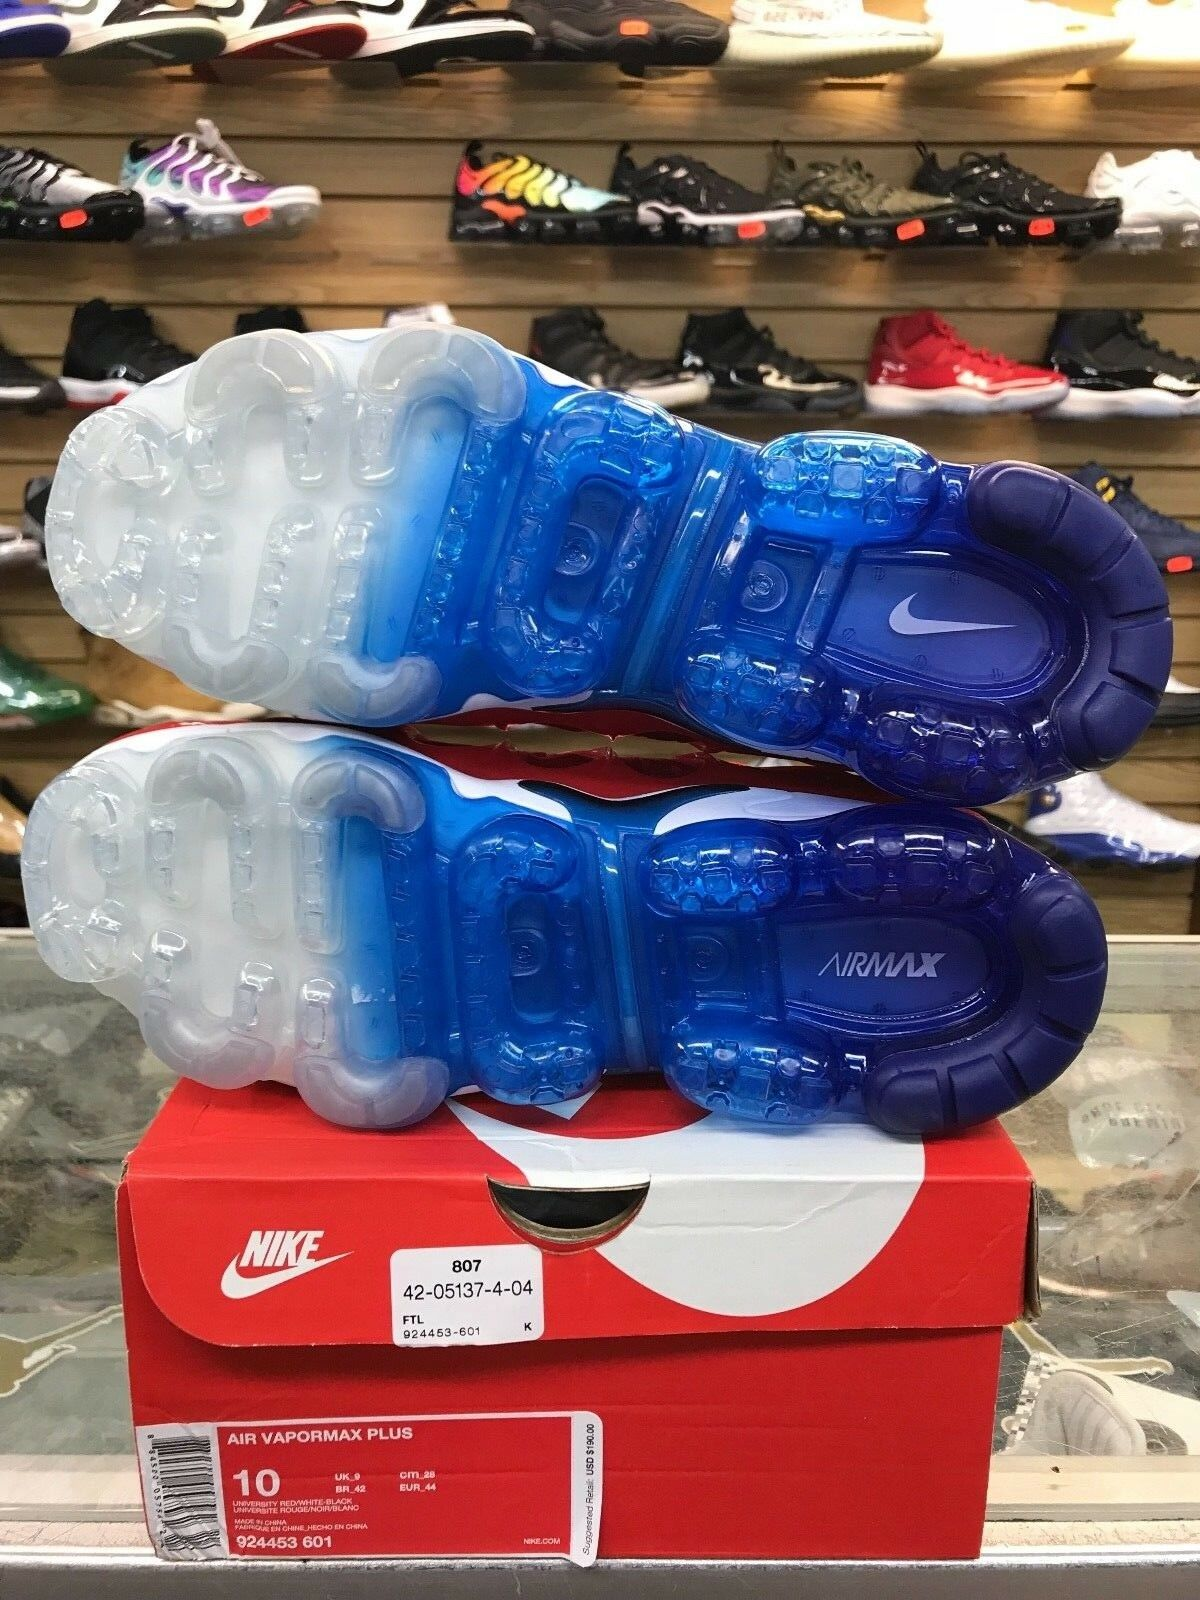 2018 Nike Air Vapormax Plus USA University Red White Blue BLK 924453 601 10